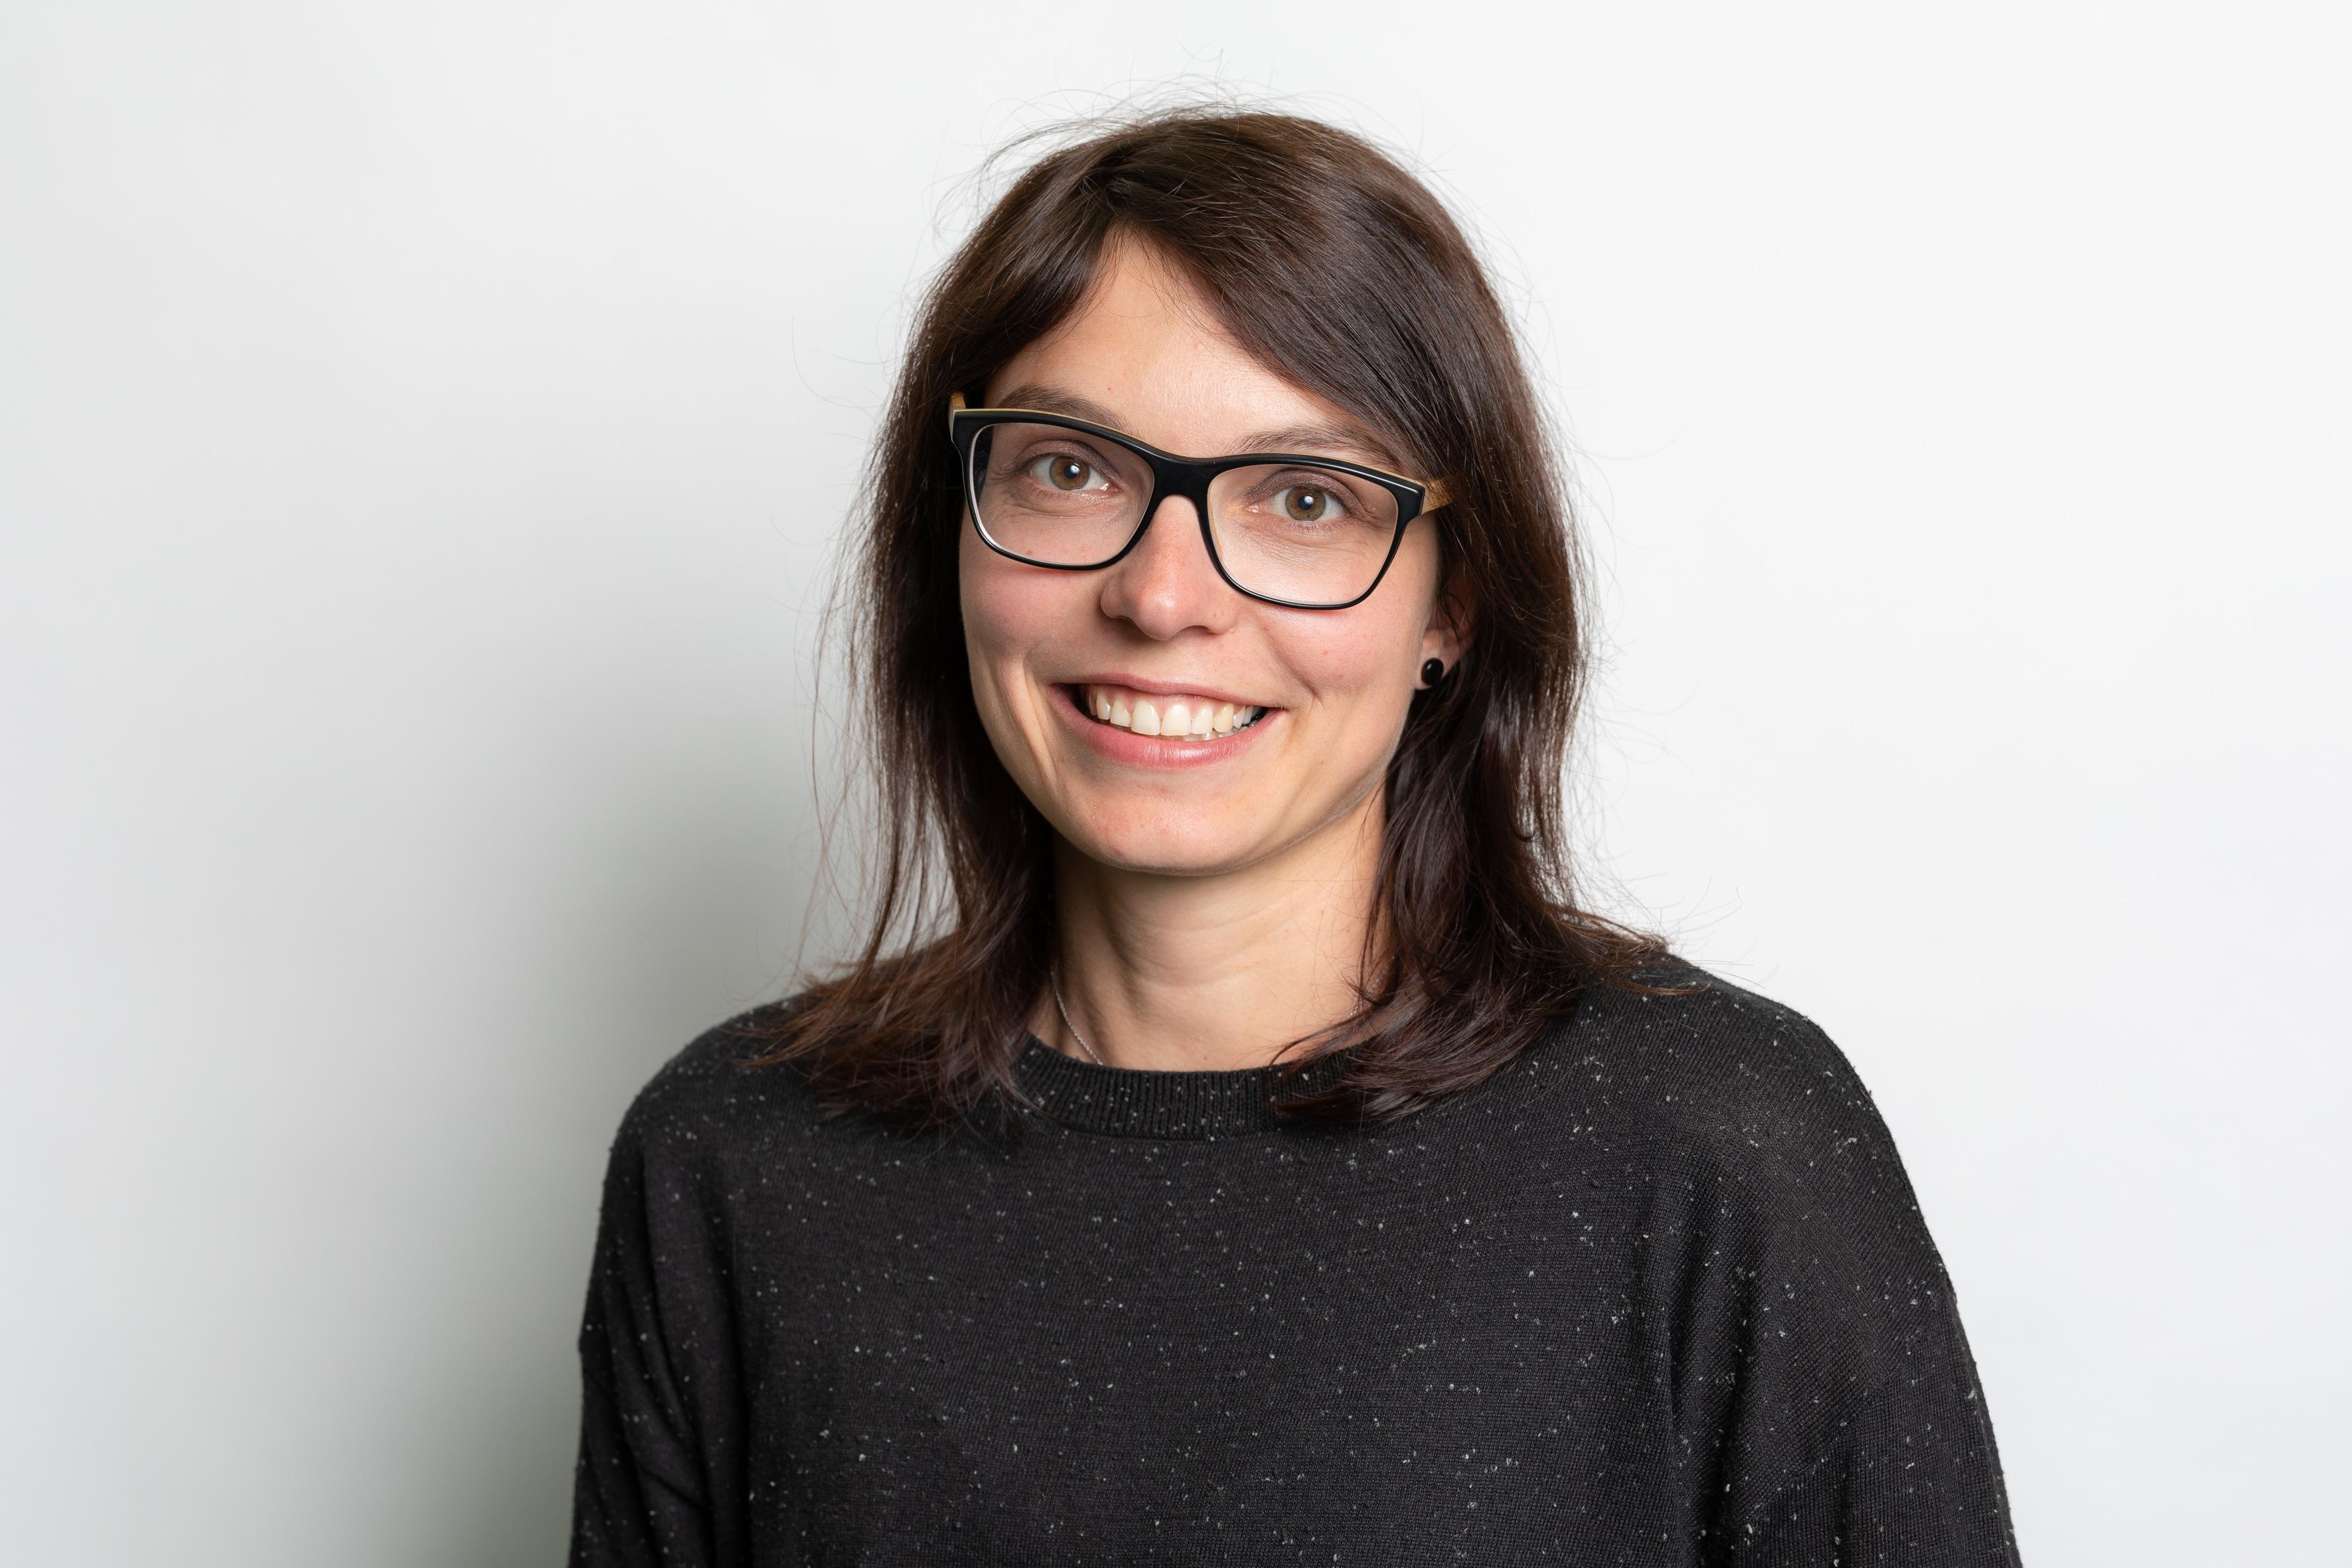 Mag. Maria Danzl, Koordinatorin Mils I